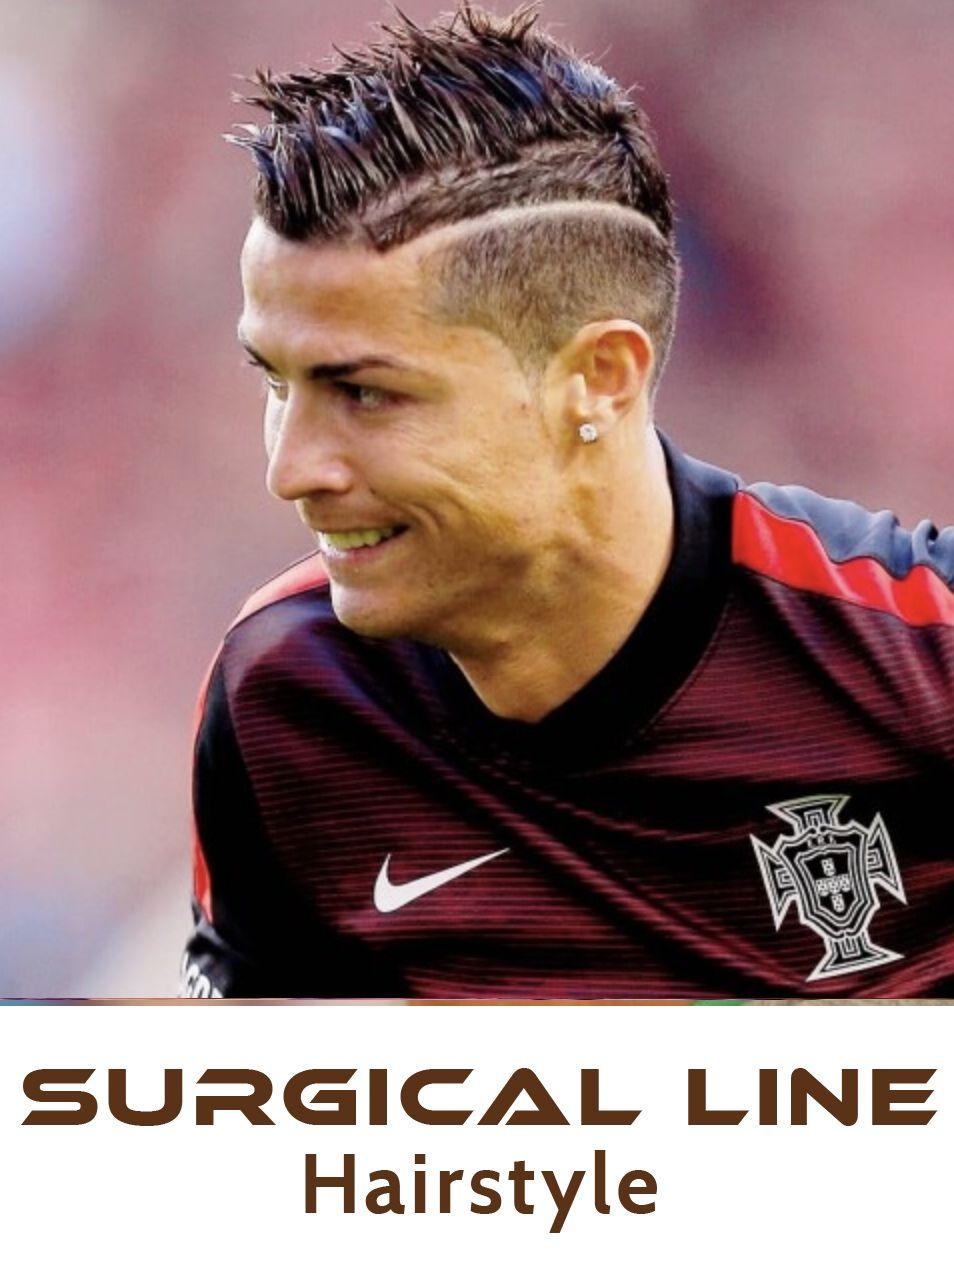 cristiano ronaldo surgical line hairstyles. ronaldo haircut